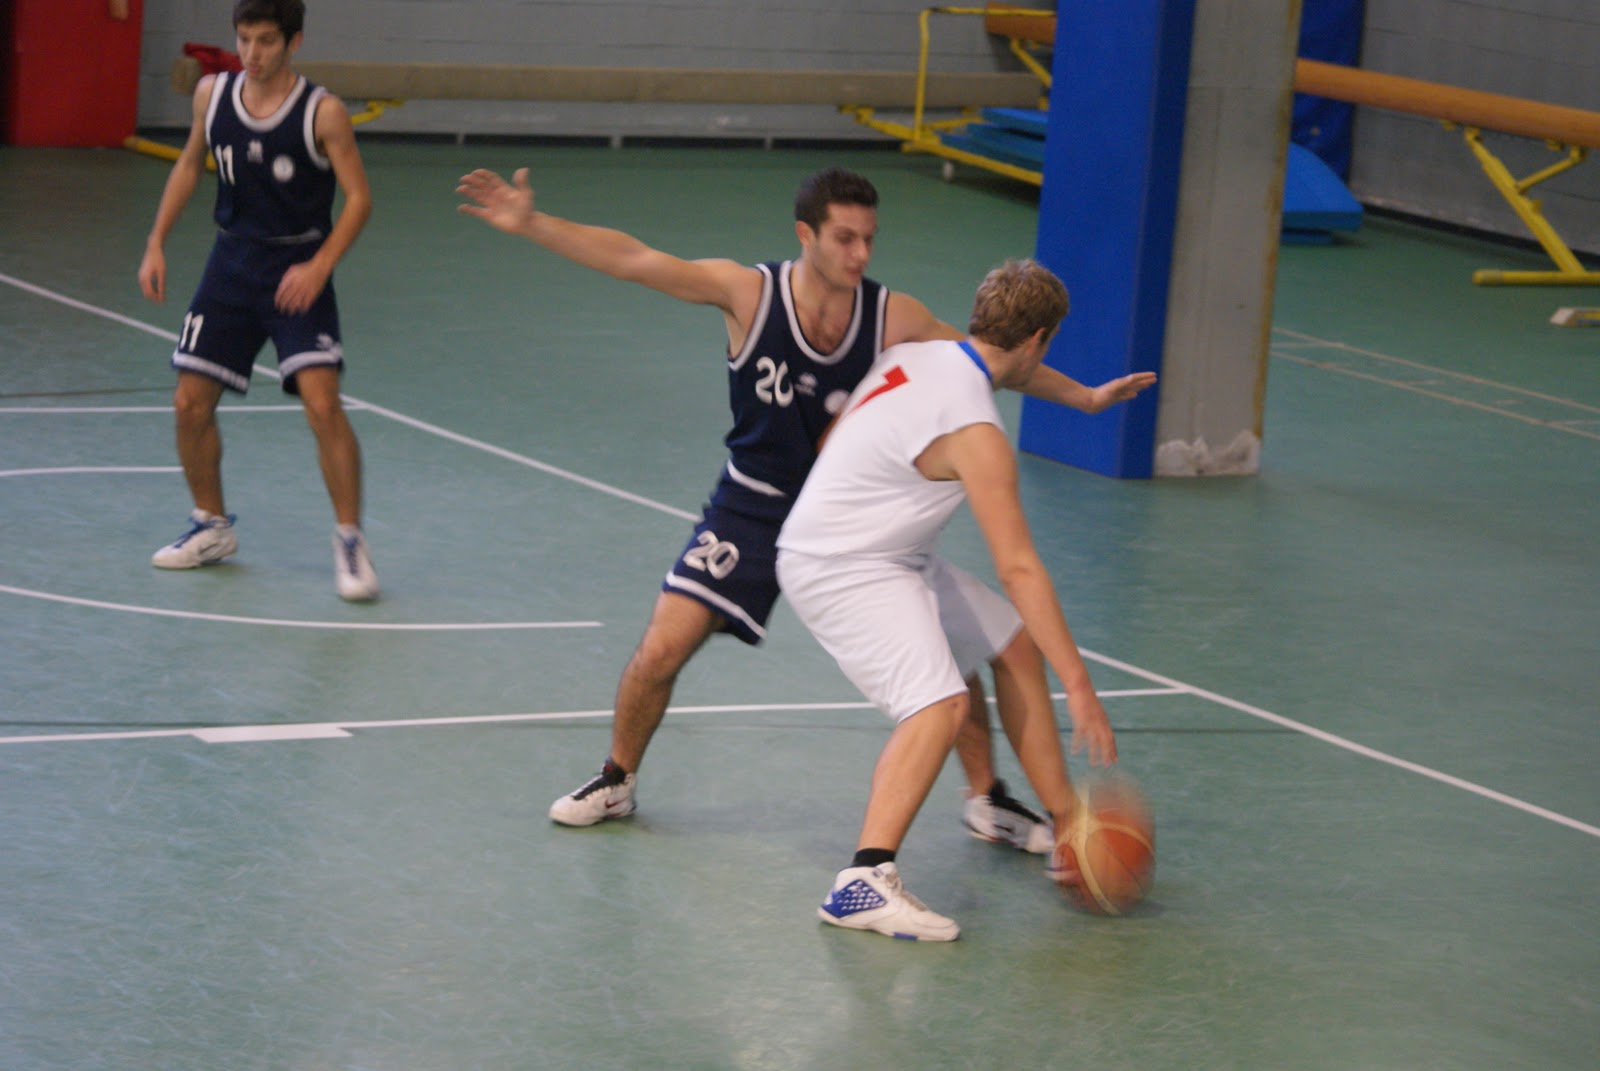 Scuola Media Vergani Novate Milanese.Polisportiva Novate Basket Minibasket Under 18